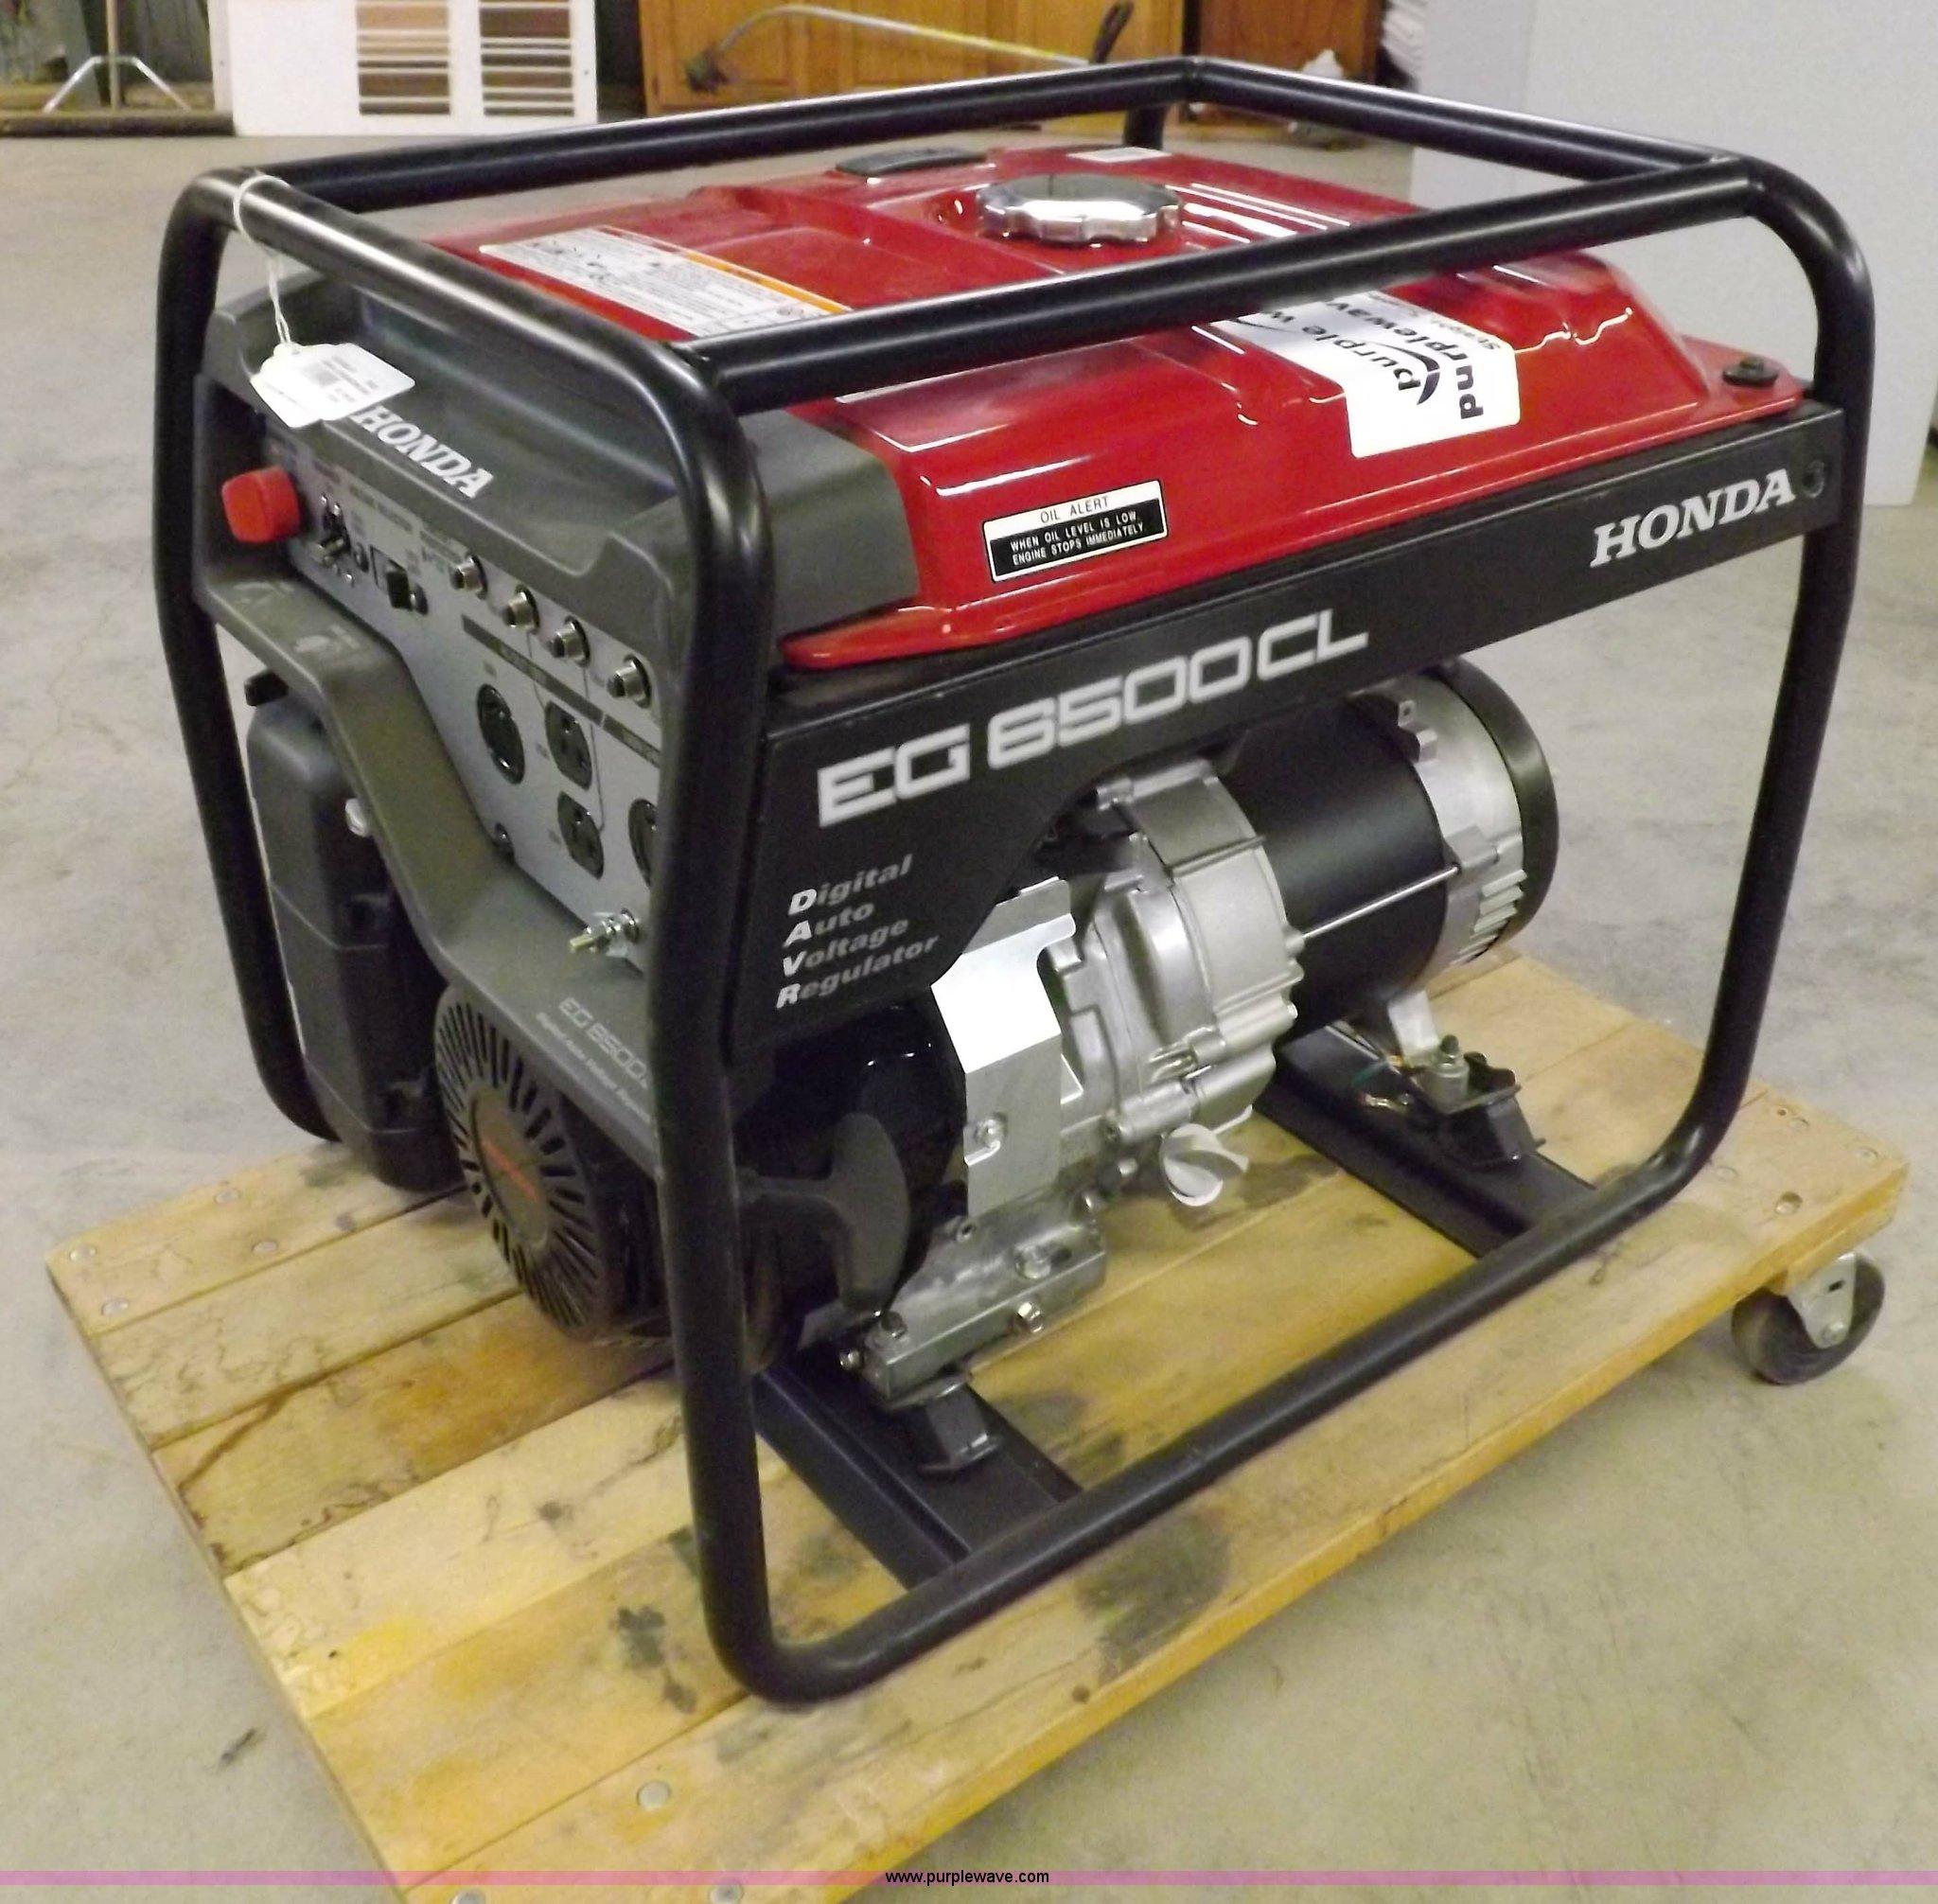 Honda EG6500CL 6 5 kW generator Item H7104